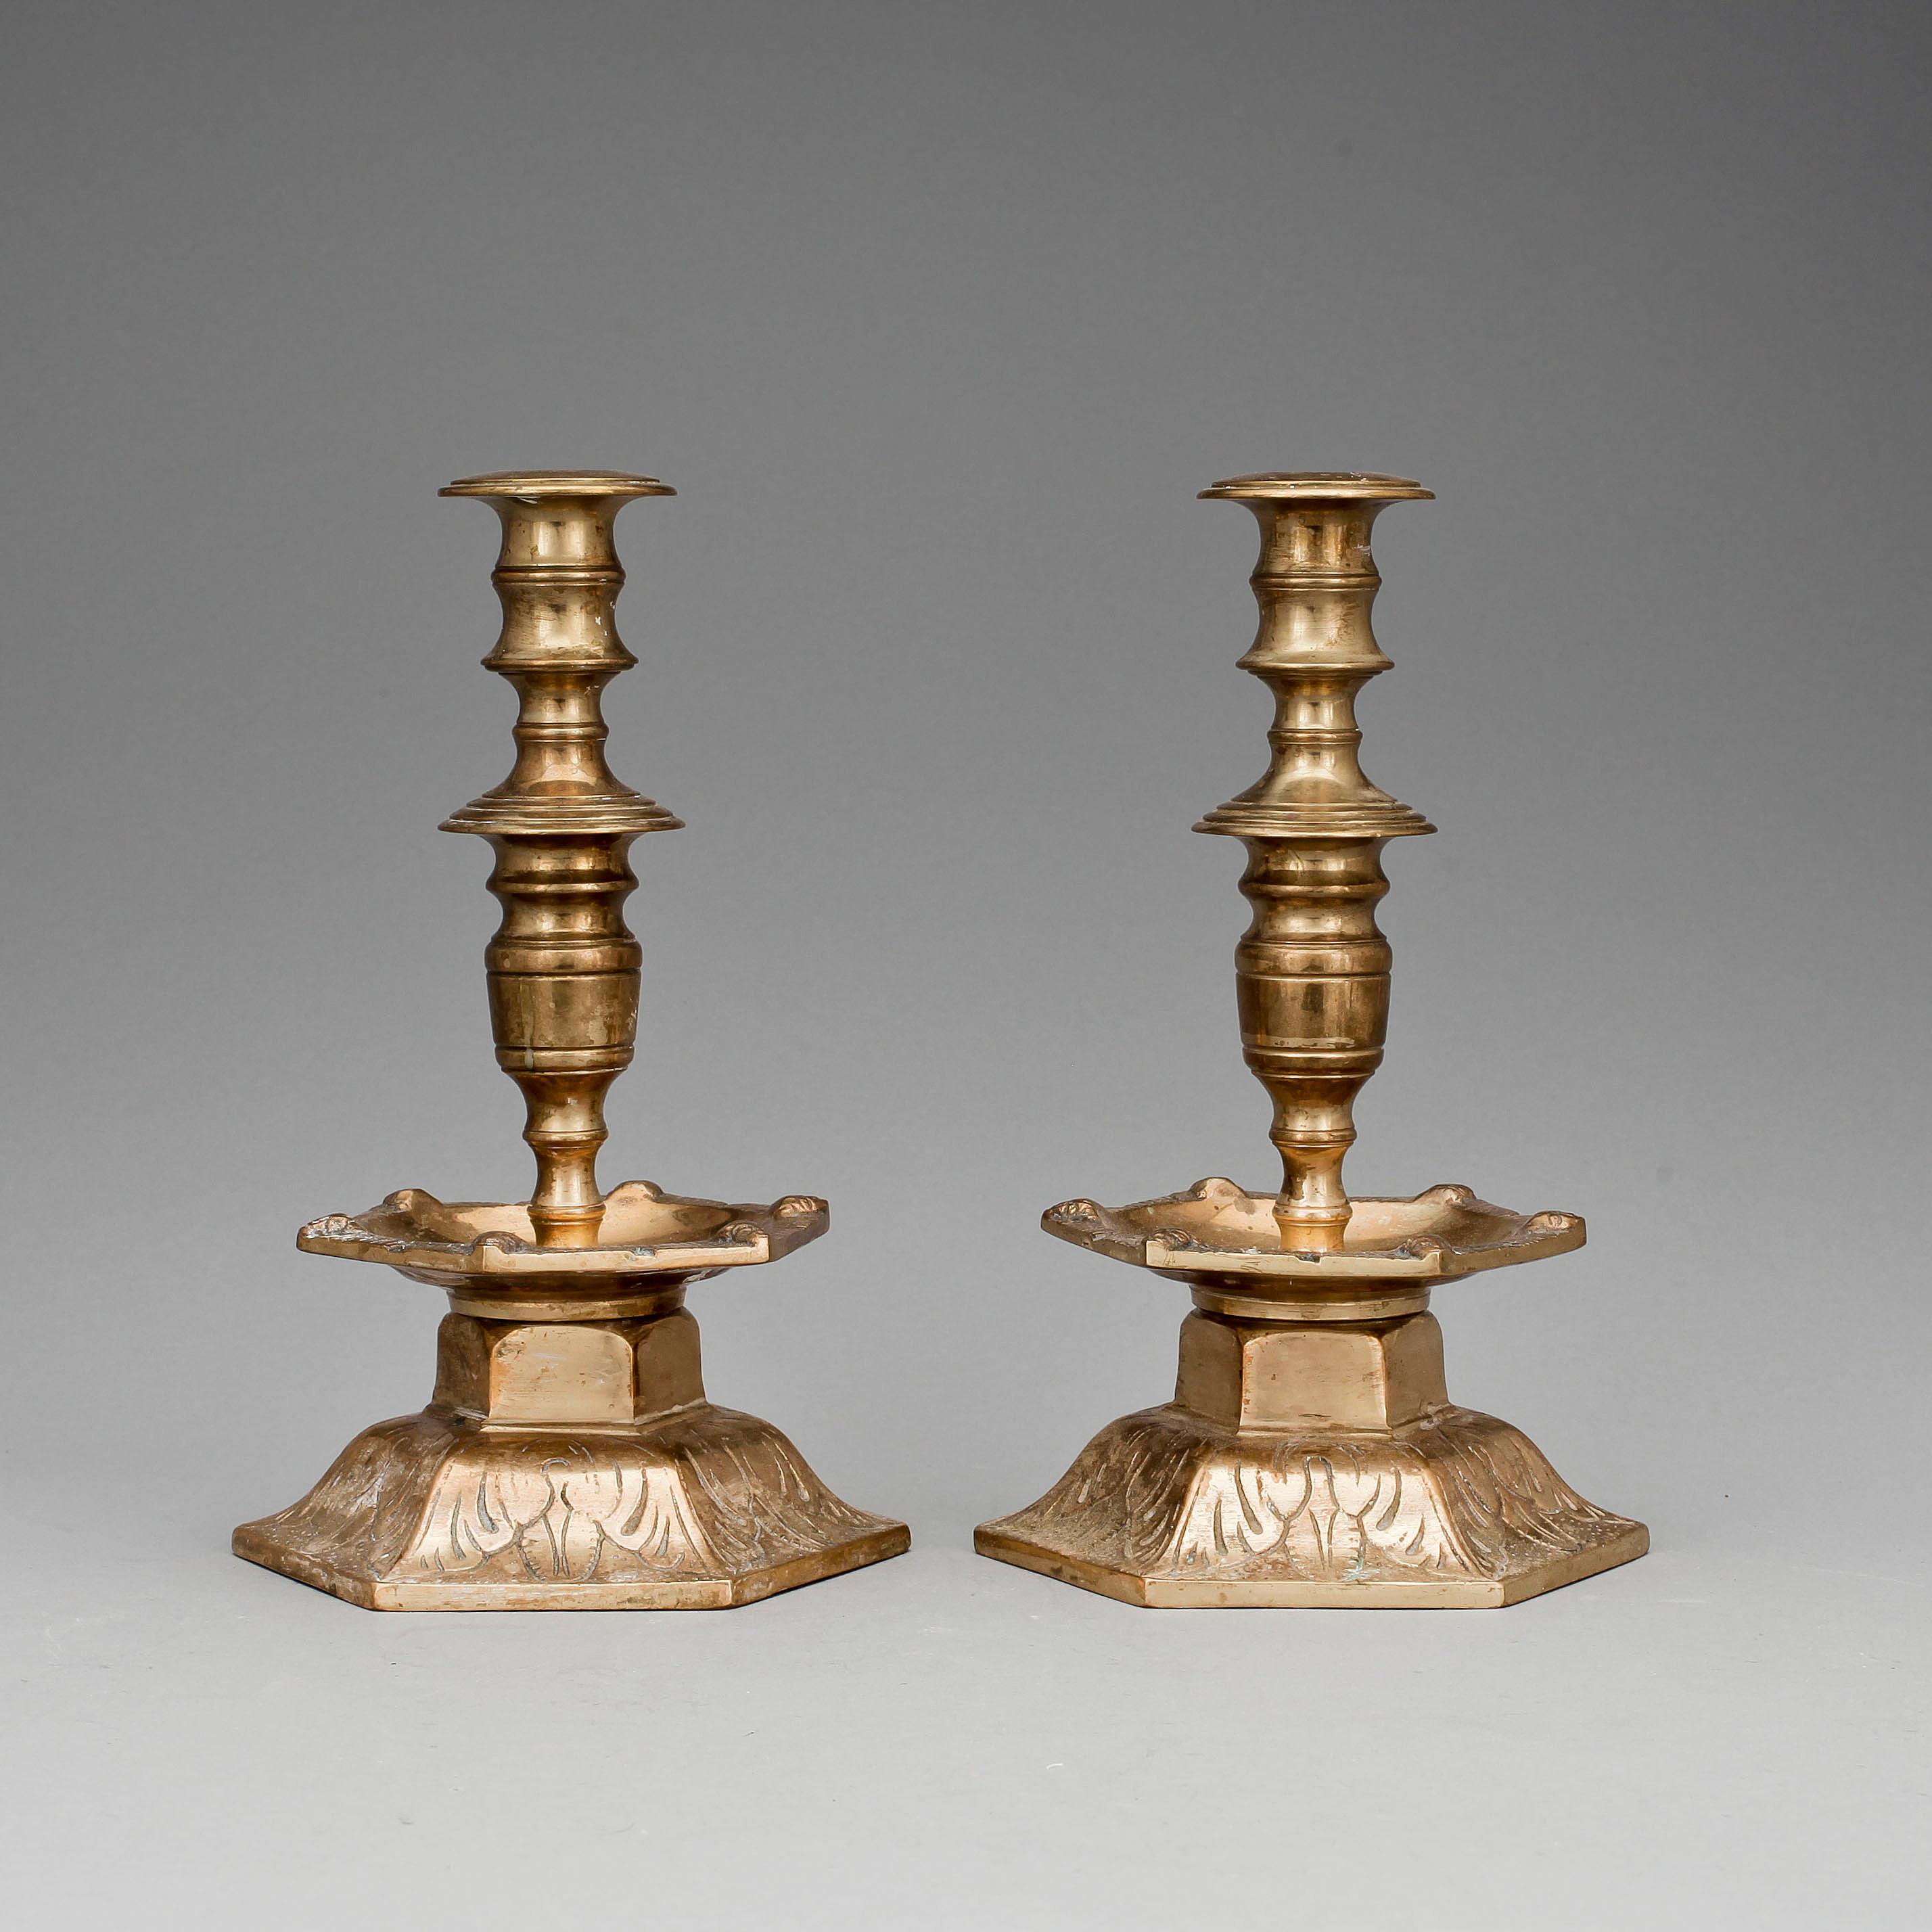 malm ljusstake LJUSSTAKAR, ett par, malm, barockstil, 1800 tal.   Bukowskis malm ljusstake